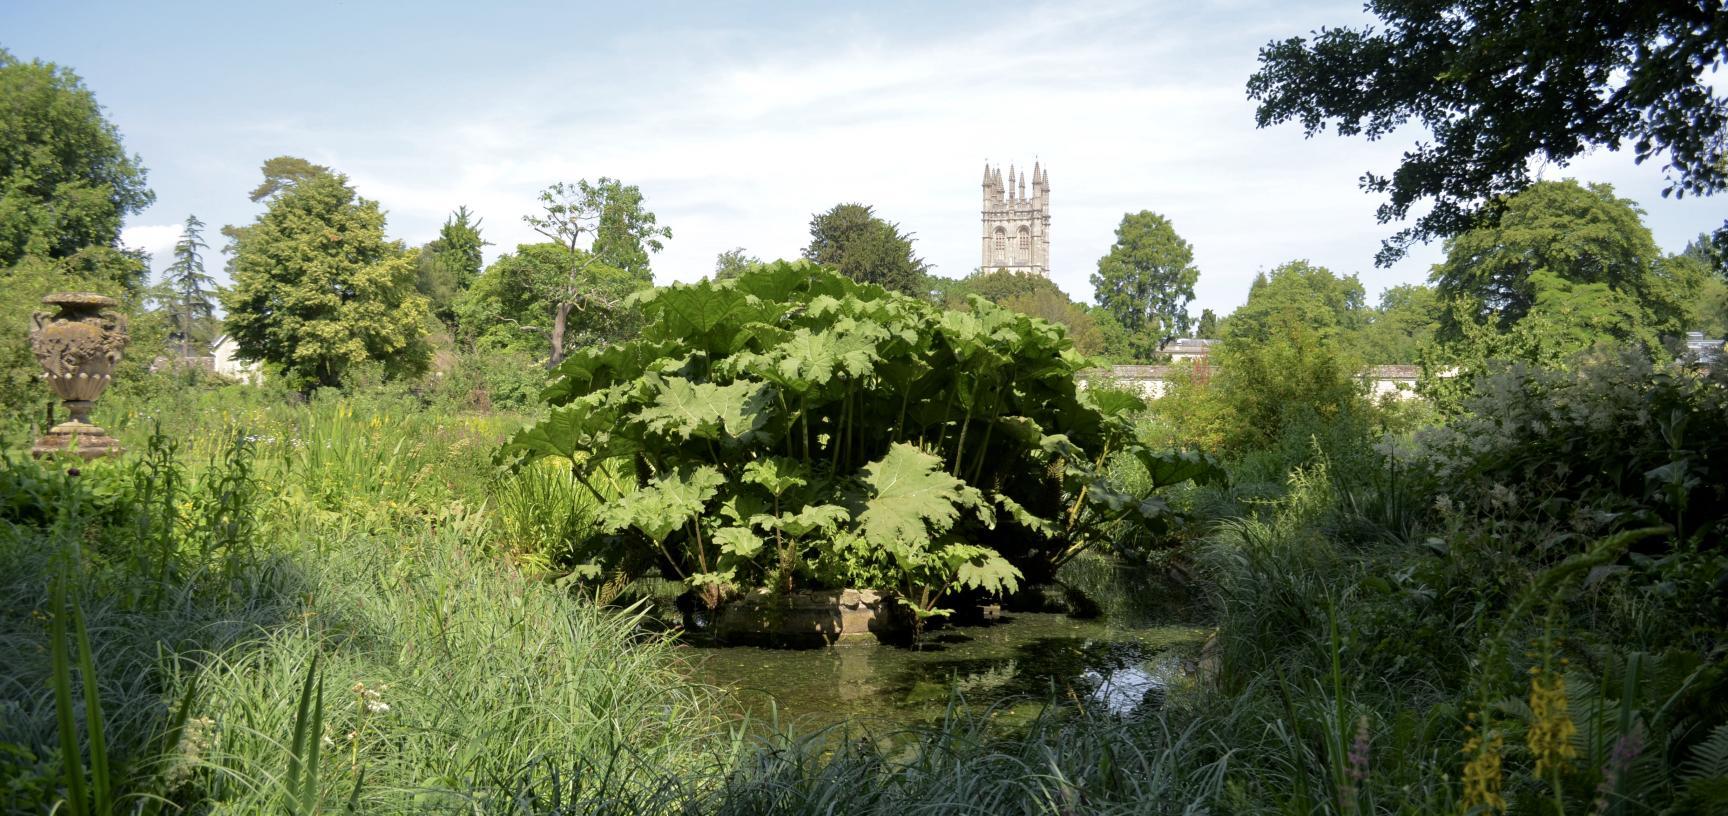 The Bog Garden and Magdalen Tower